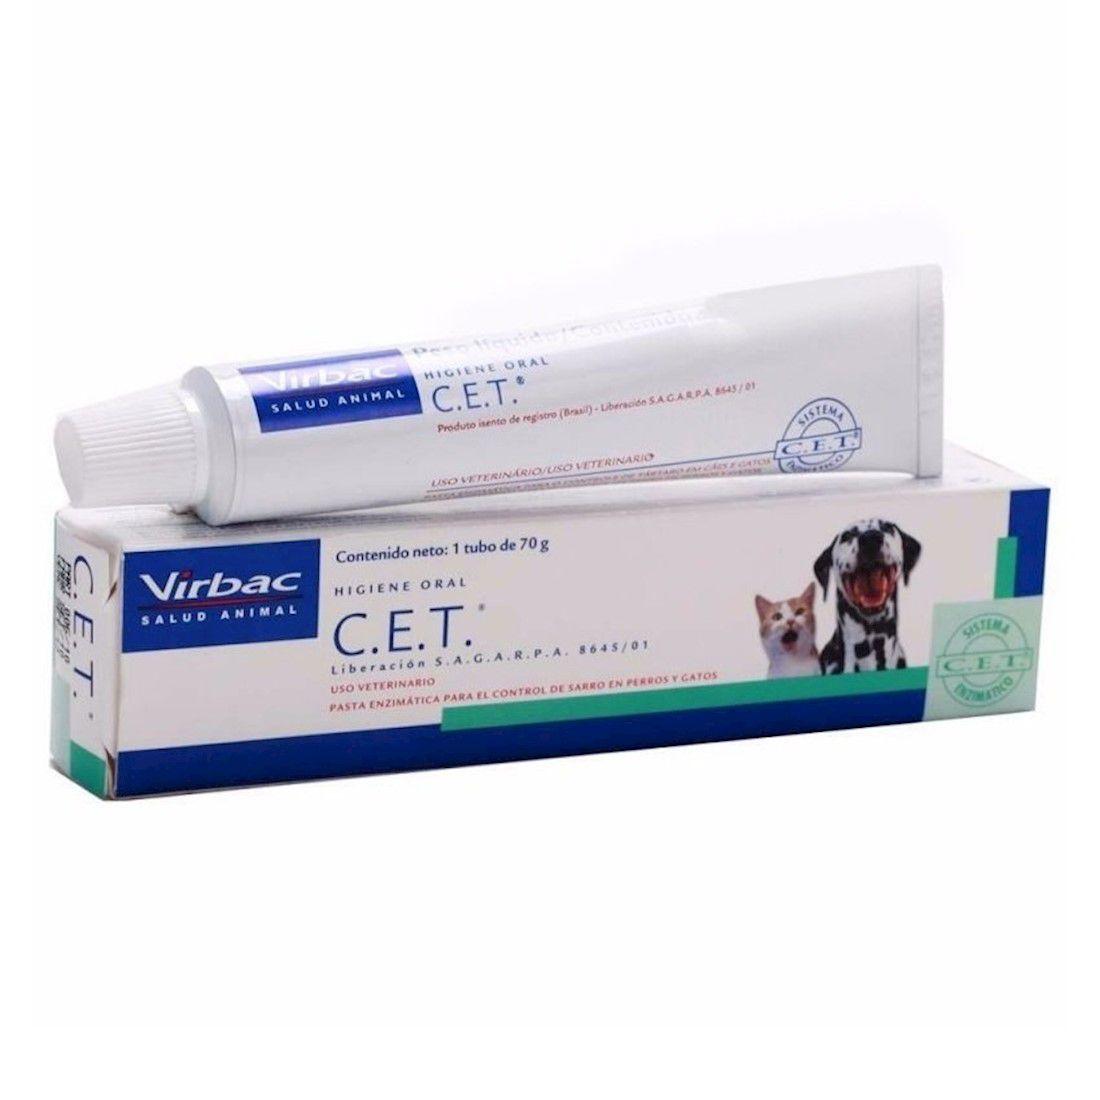 C.E.T. Higiene Oral Pasta Virbac